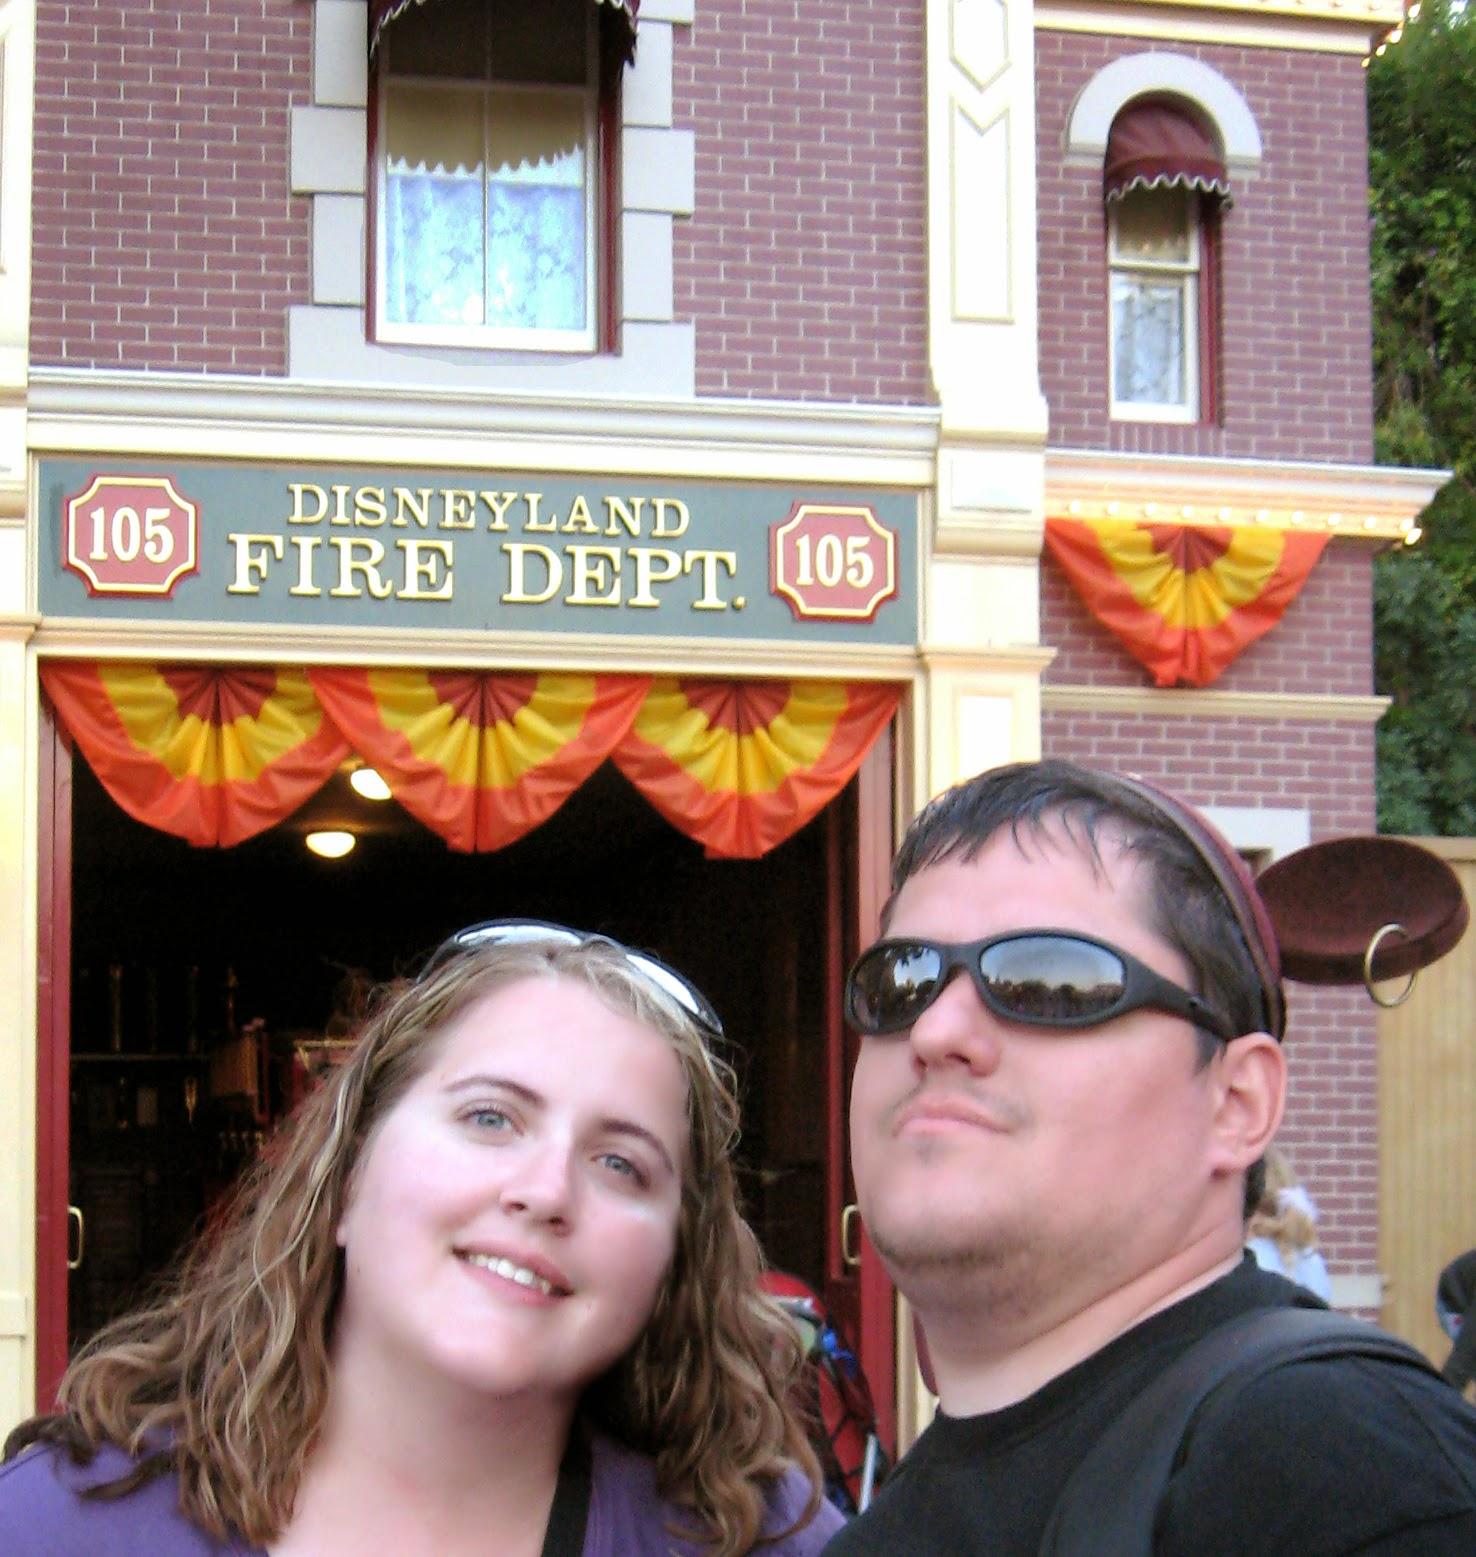 10 Iconic Disneyland Photo locations from LoveOurDisney.com